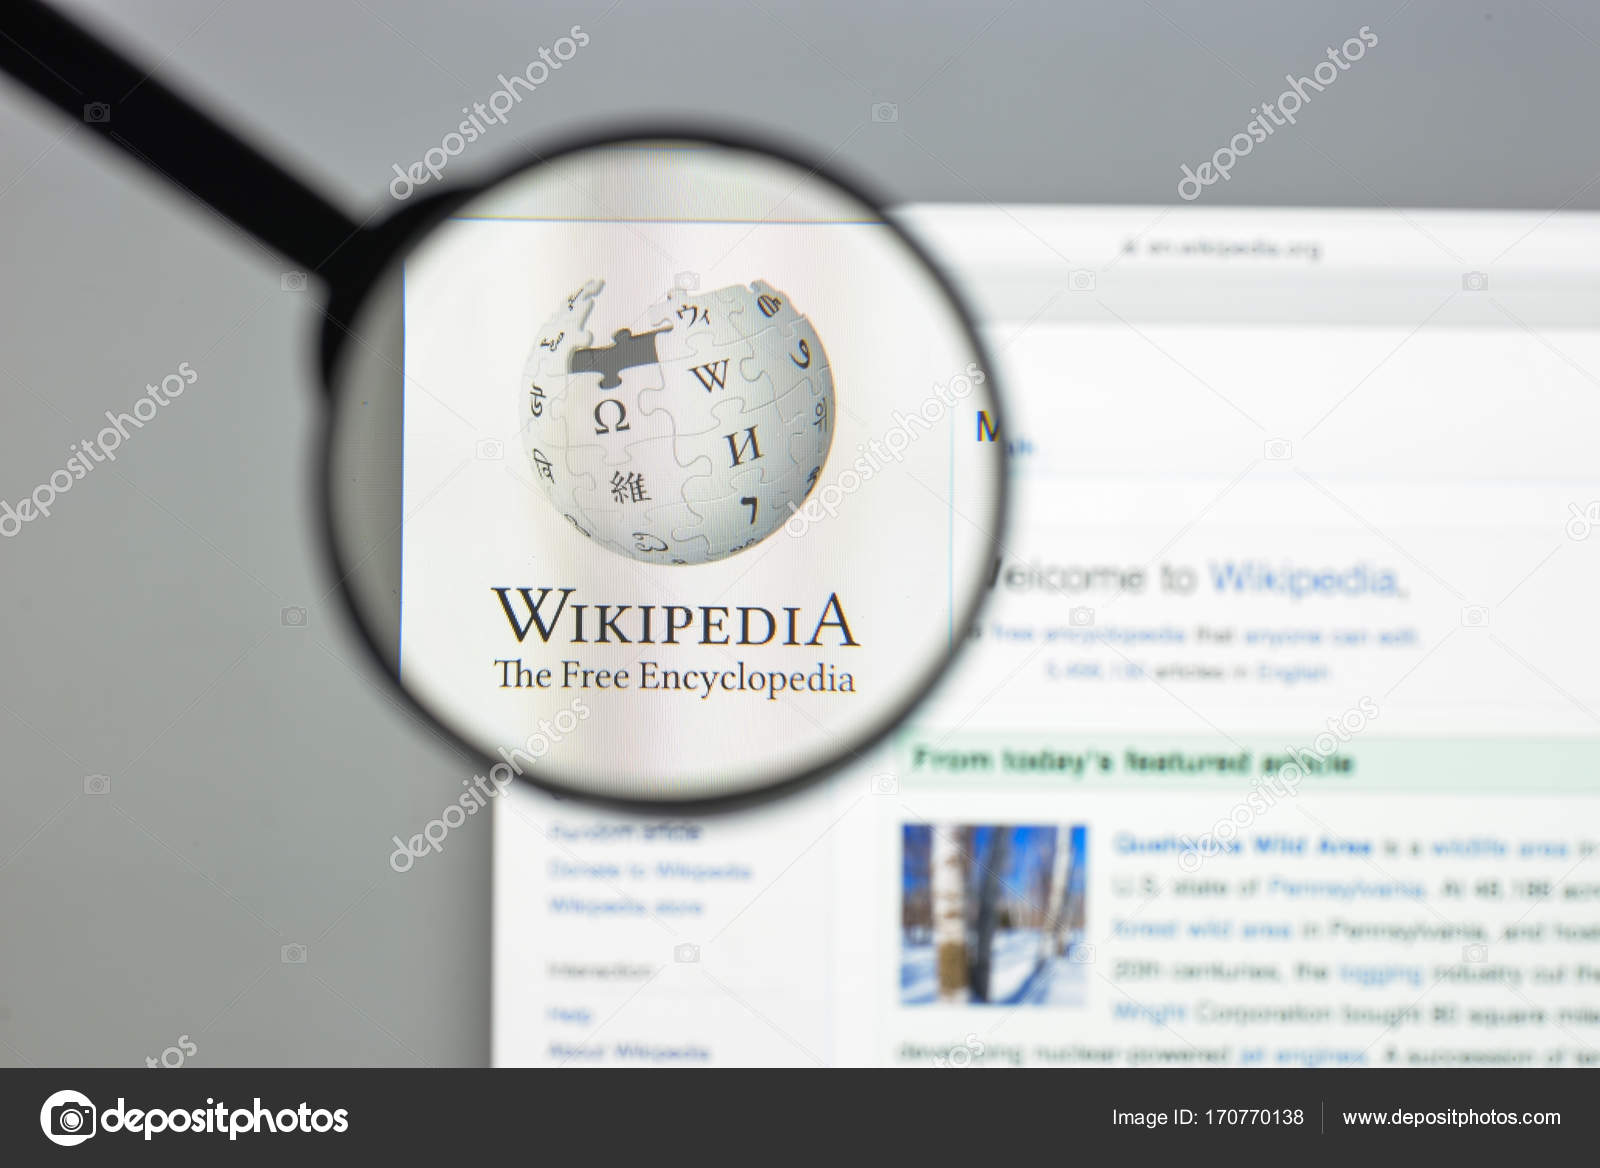 Milan, Italy - August 10, 2017: Wikipedia website homepage